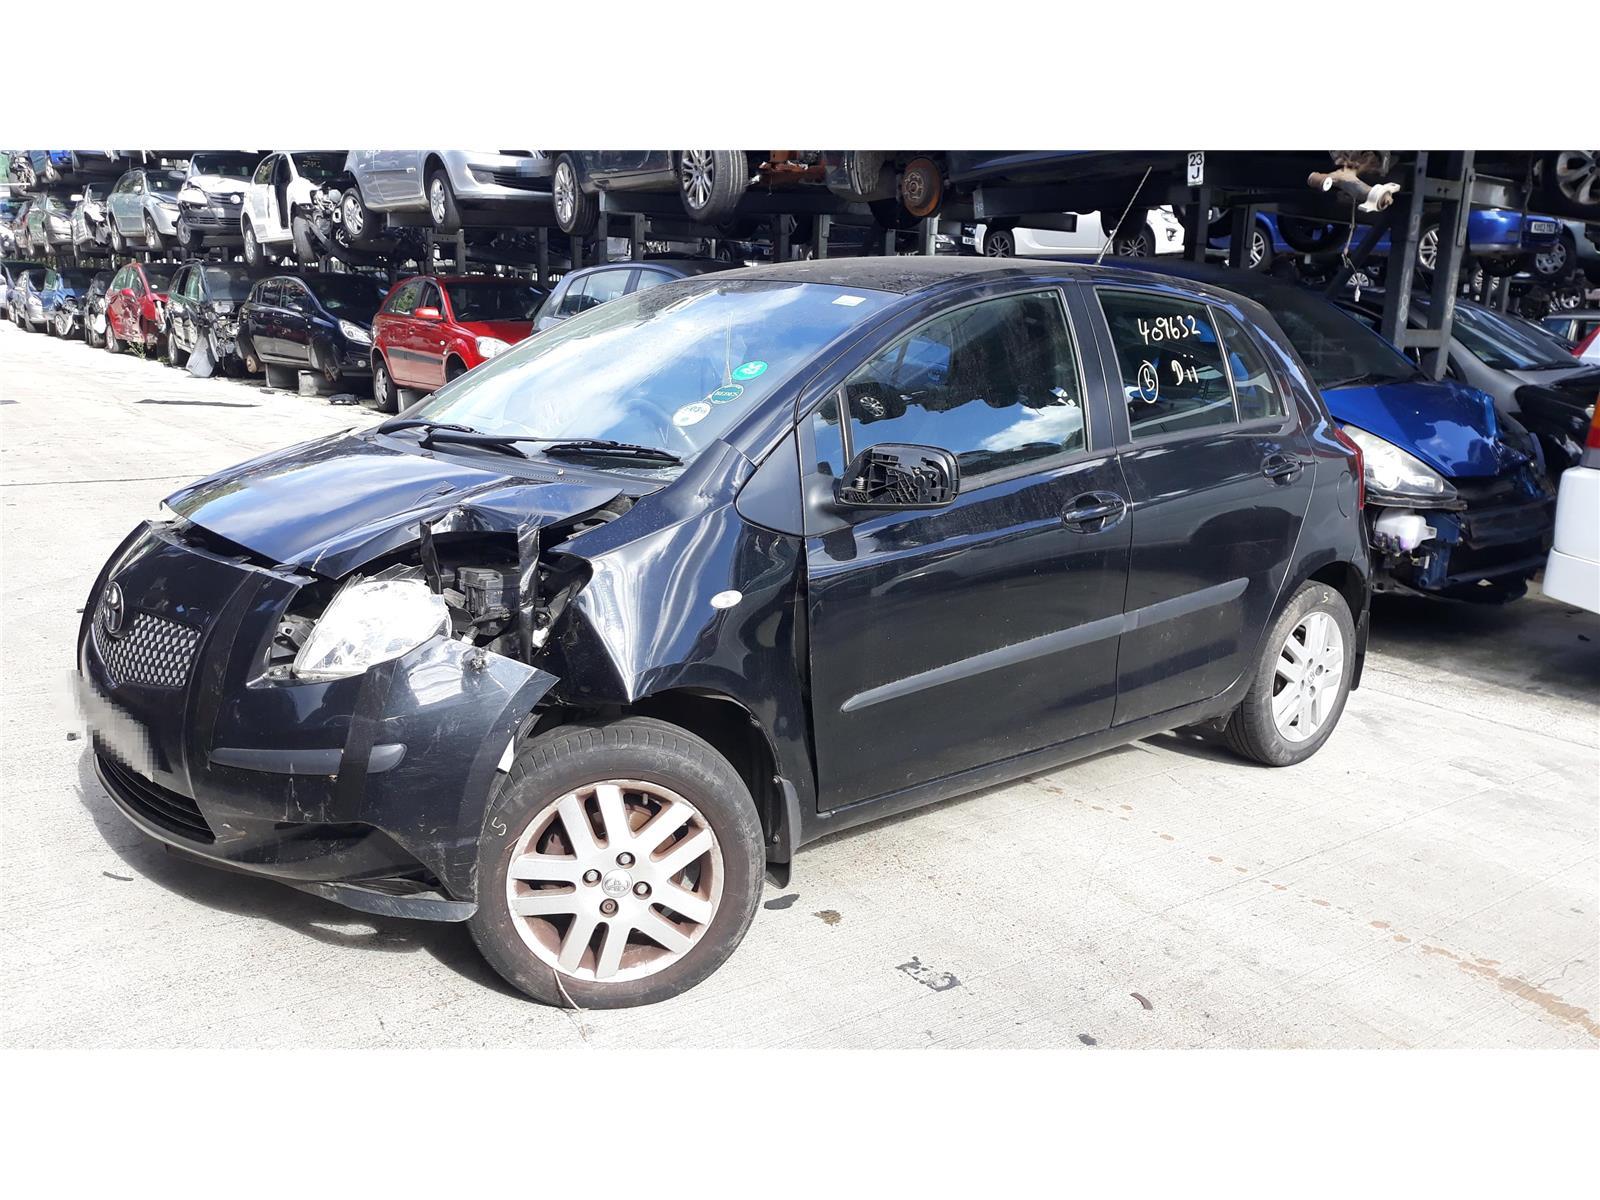 2007 Toyota Yaris 2006 To 2011 Tr Vvt I 13l Manual Petrol Black Car Vitz Fuse Box Seat Belt Front Reel Rh